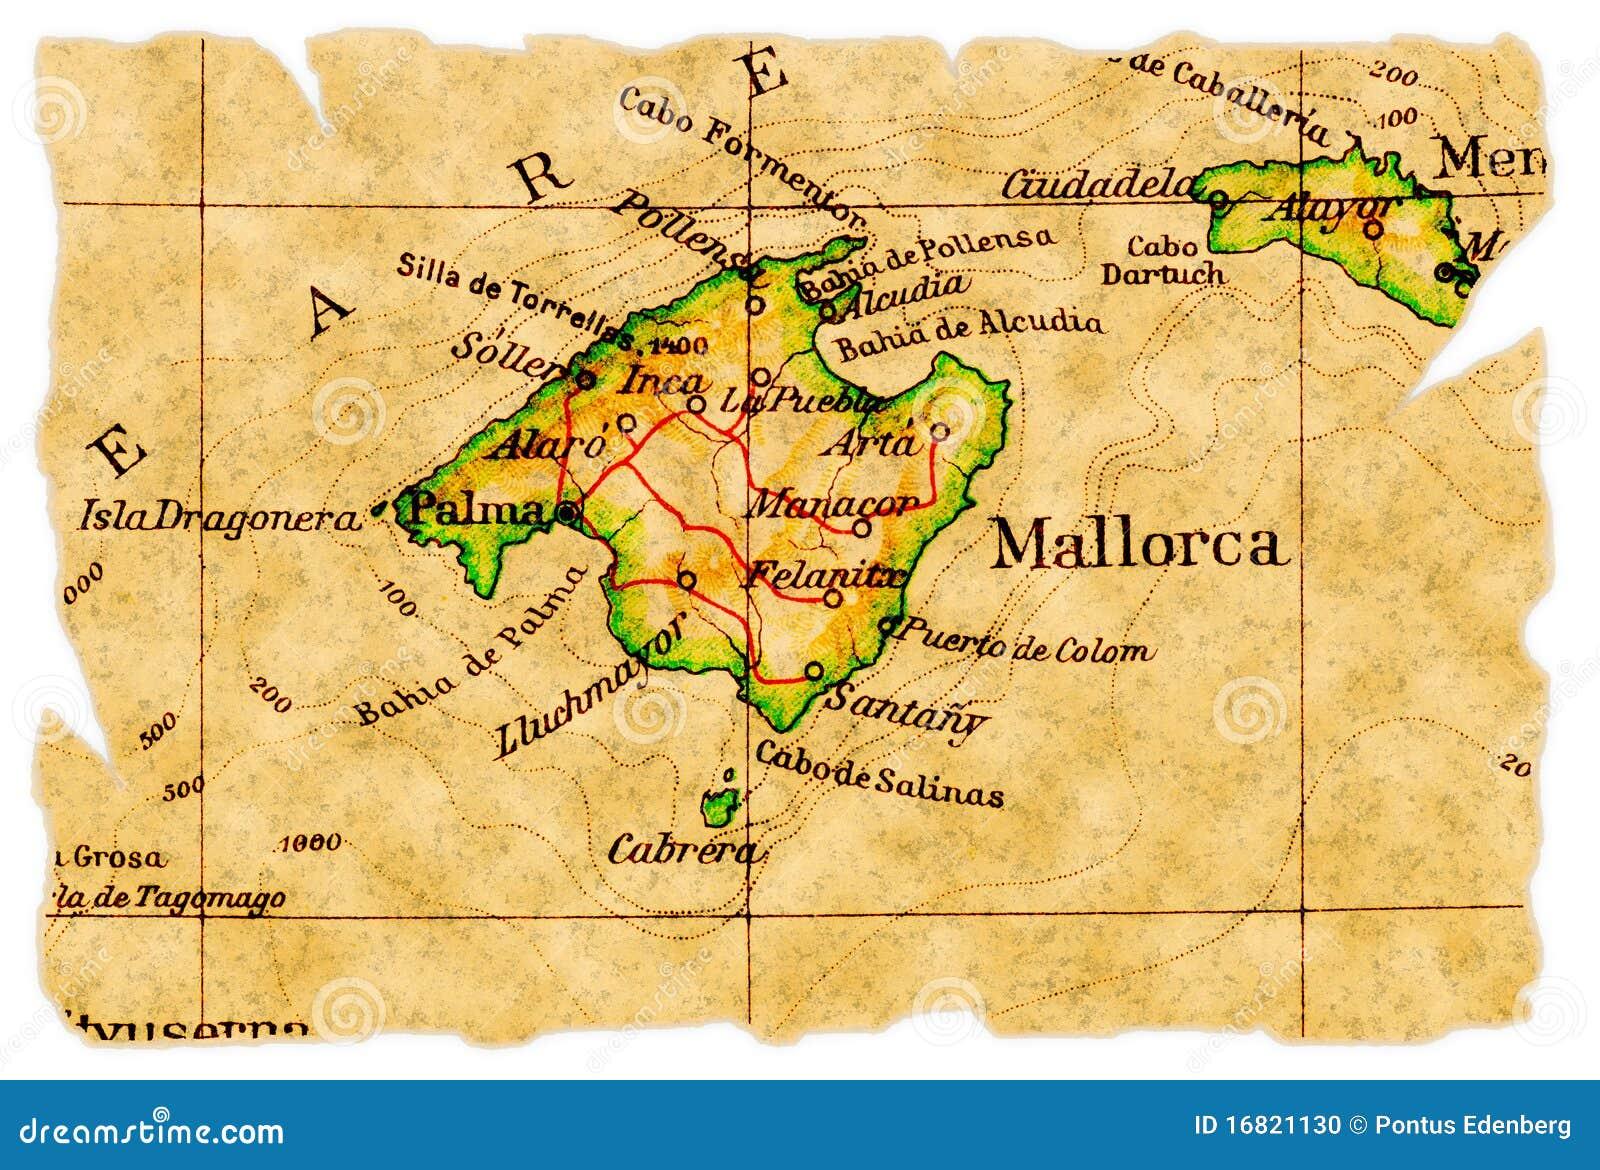 Mallorca old map stock photo. Image of maps, city, page ... on palma de mallorca, setenil de las bodegas spain map, deia spain map, europe spain map, paris spain map, ripoll spain map, catalan language, jerez de la frontera spain map, canary islands, tuscany spain map, malaga spain map, algarve spain map, usa spain map, netherlands spain map, barbastro spain map, costa del azahar spain map, egypt spain map, ireland spain map, estonia spain map, playa del ingles gran canaria map, gran canaria, sardinia spain map, norway spain map, toulouse spain map,